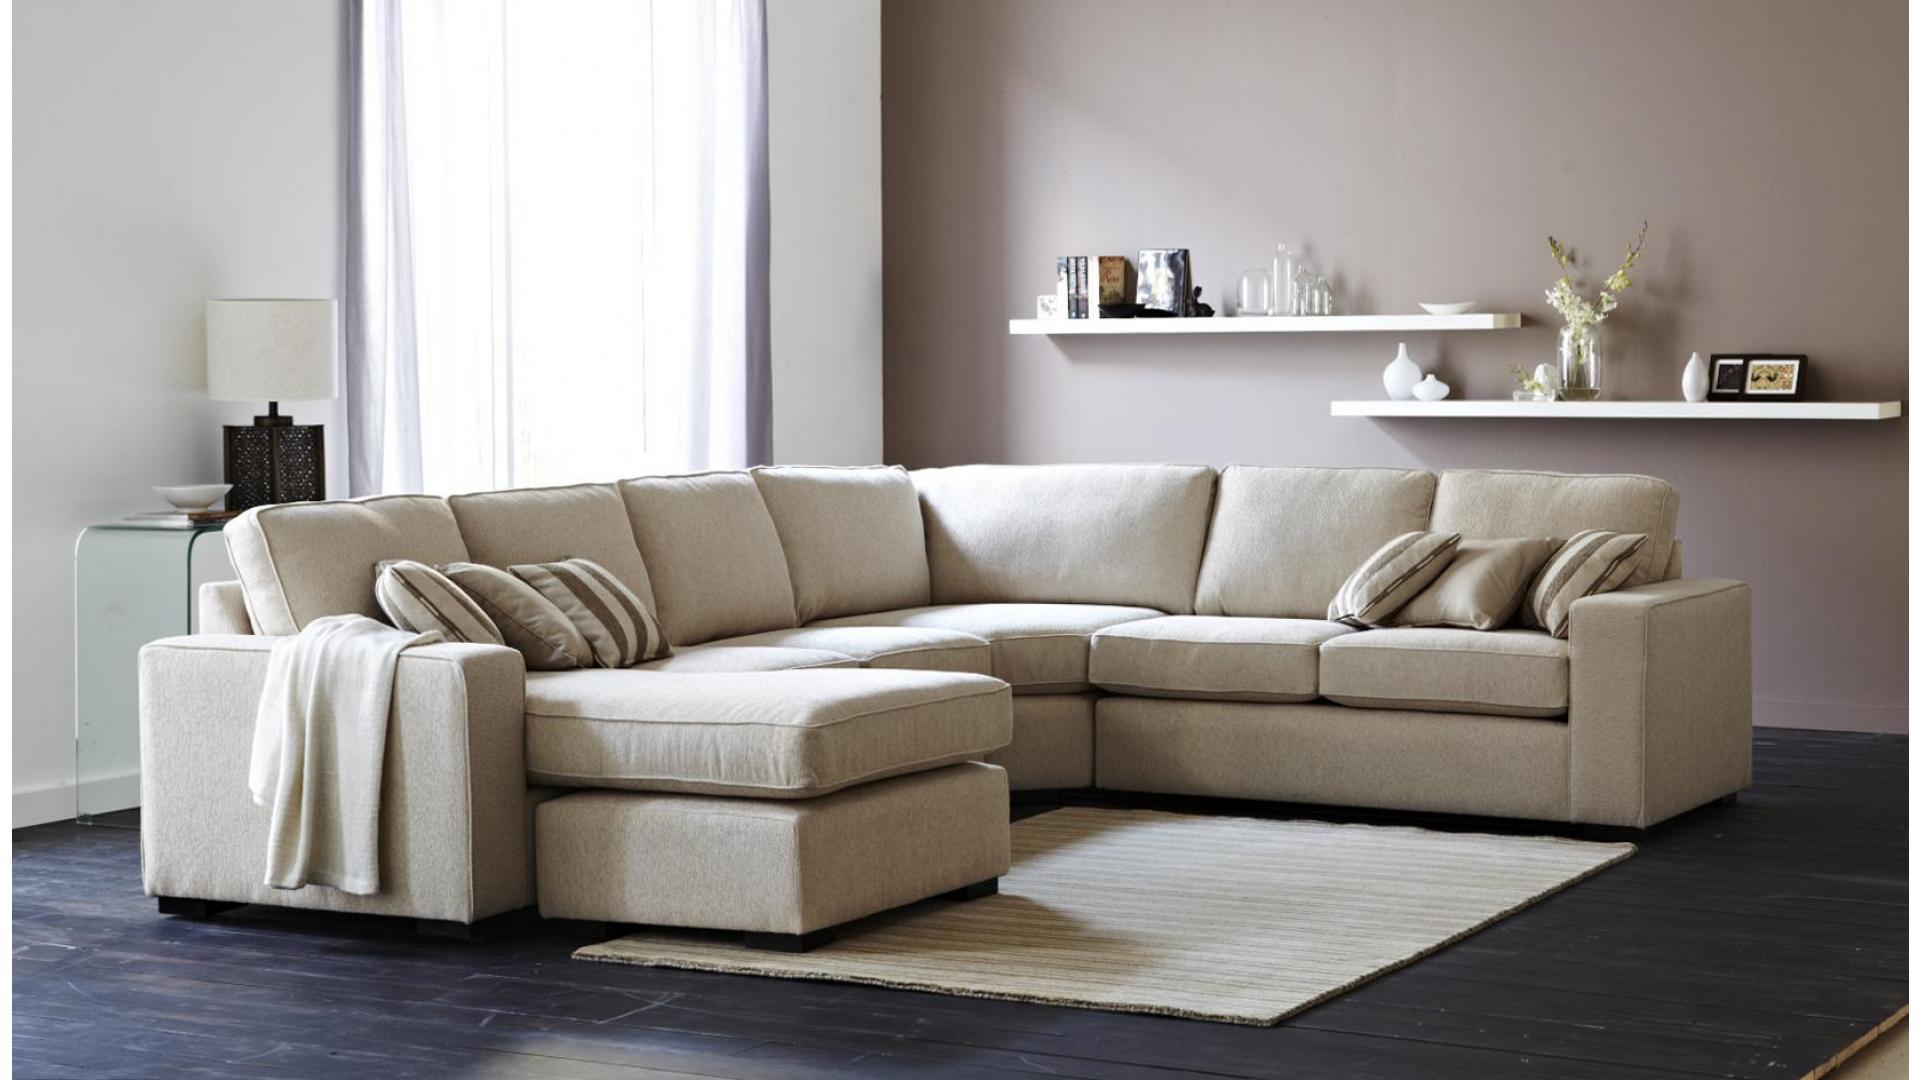 Piazza Corner Suite Homemakers Furniture